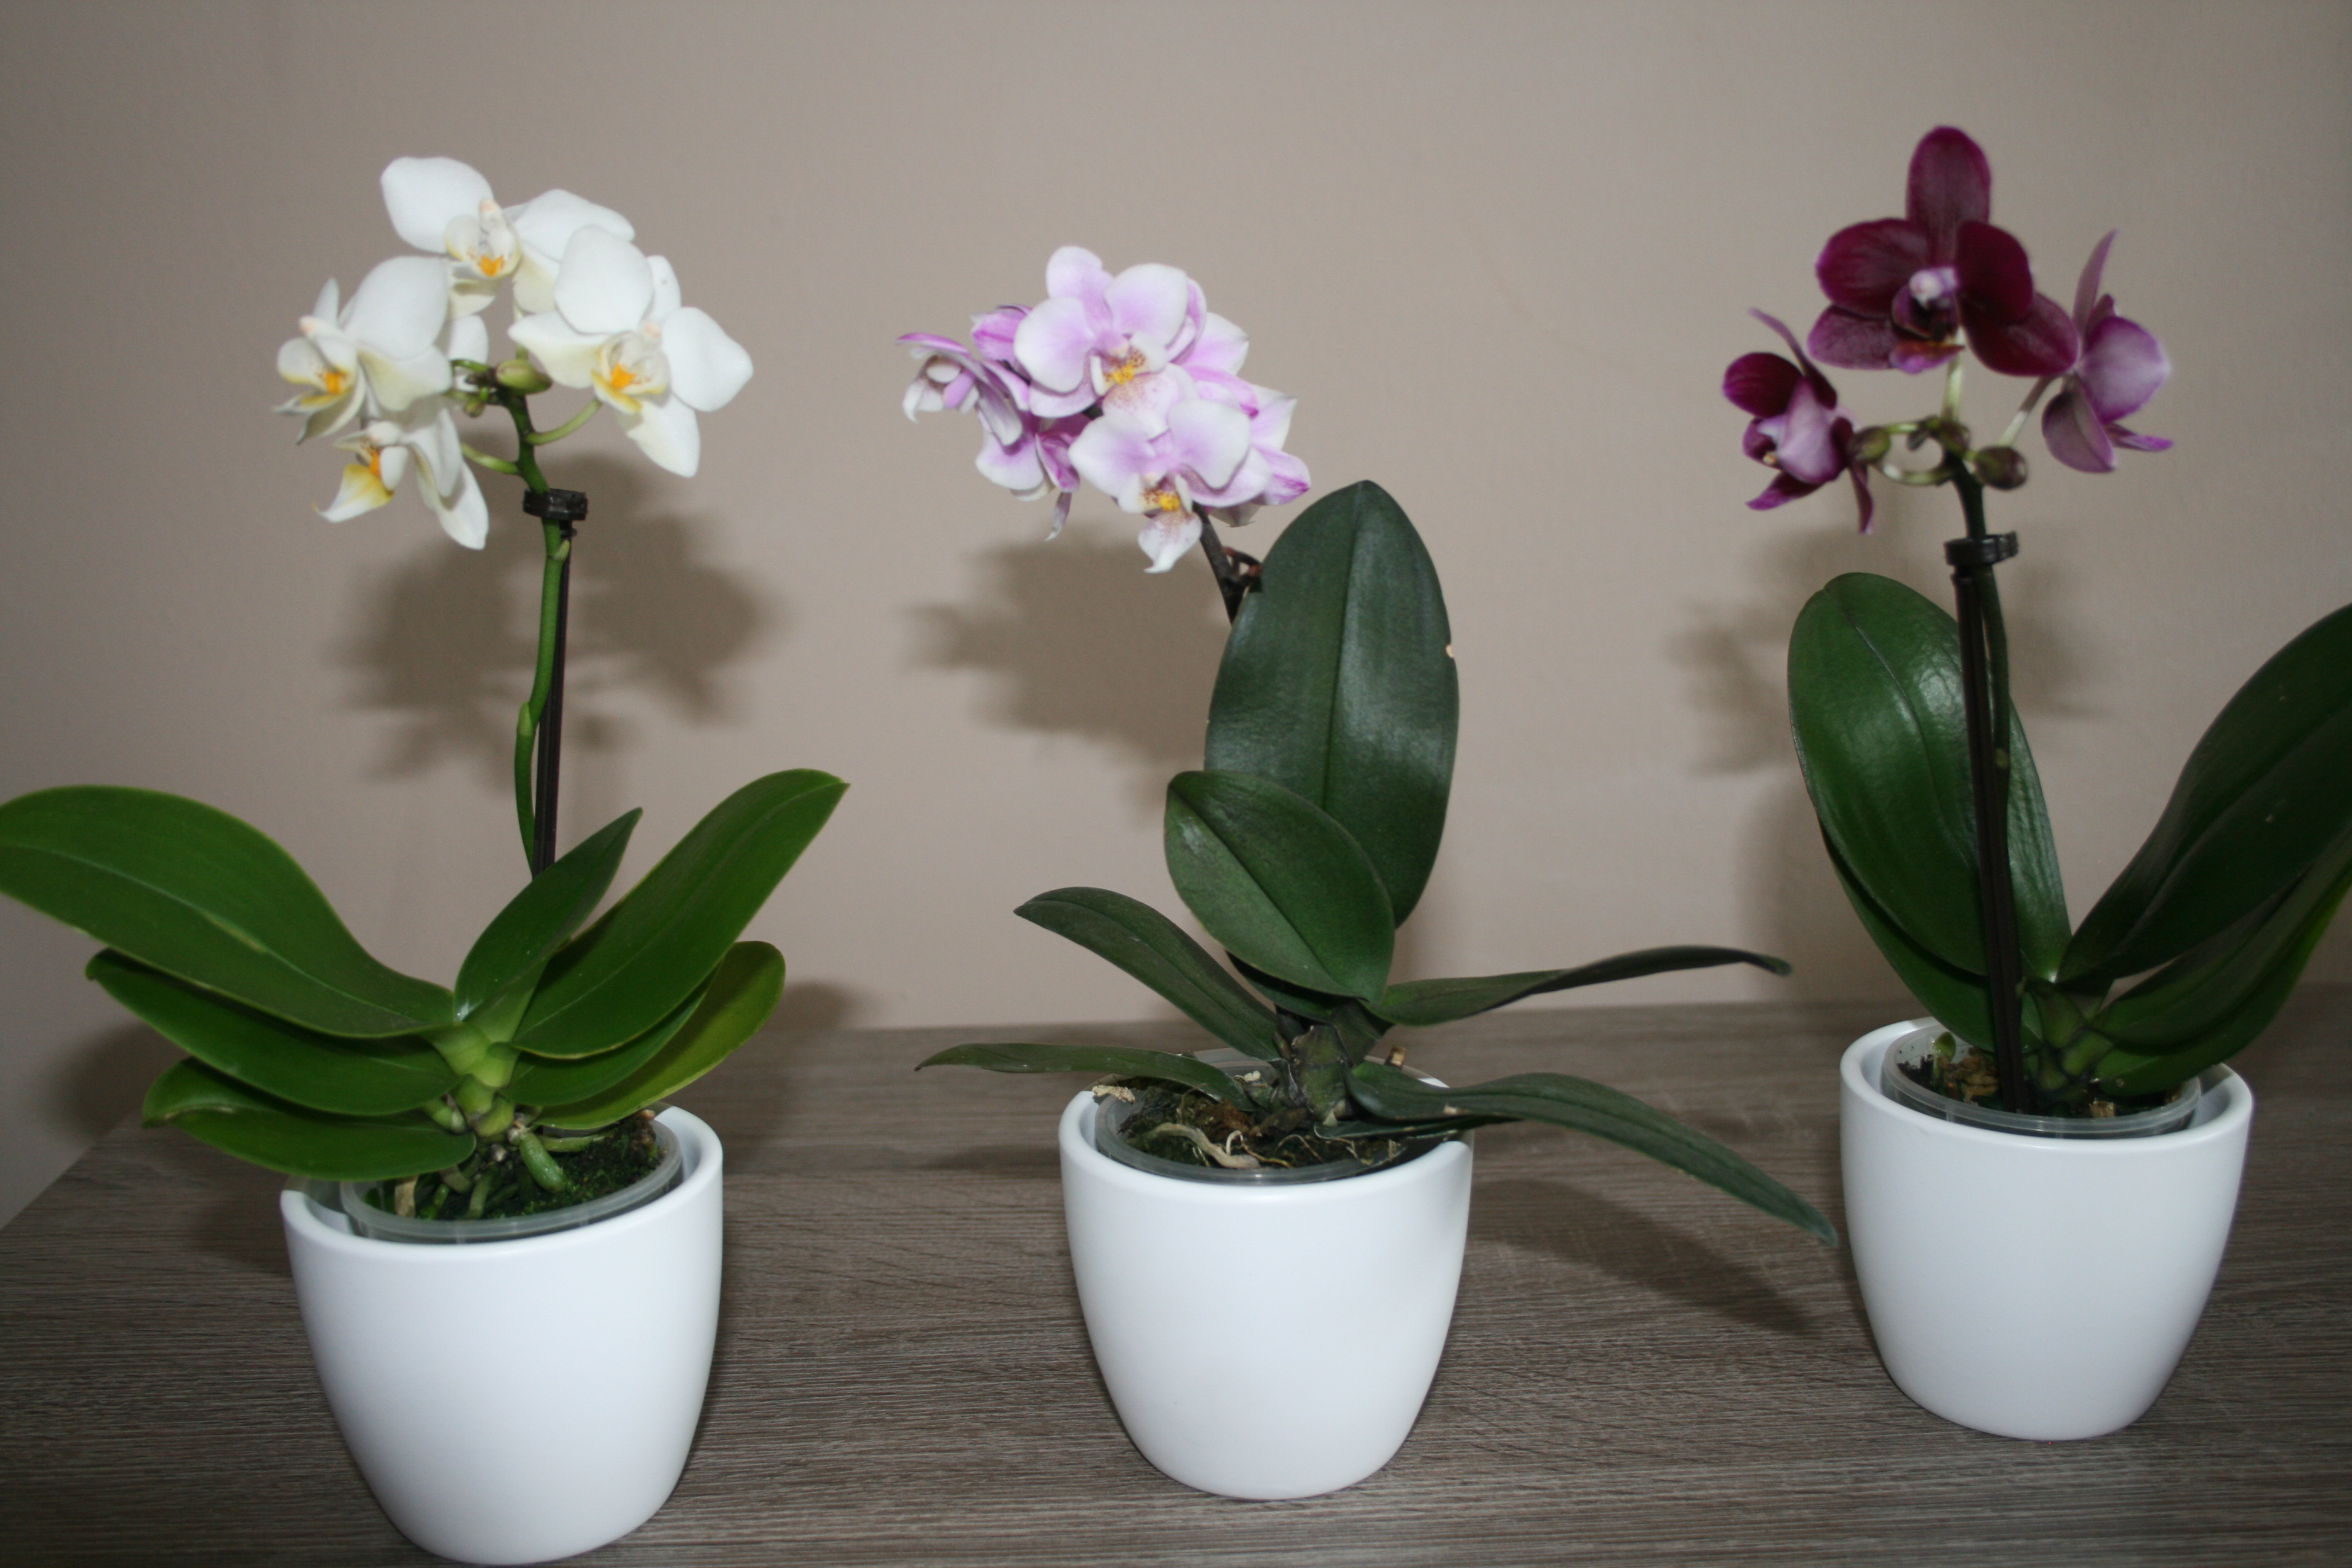 Kupujemy Storczyka Miscatalina Pl Blog